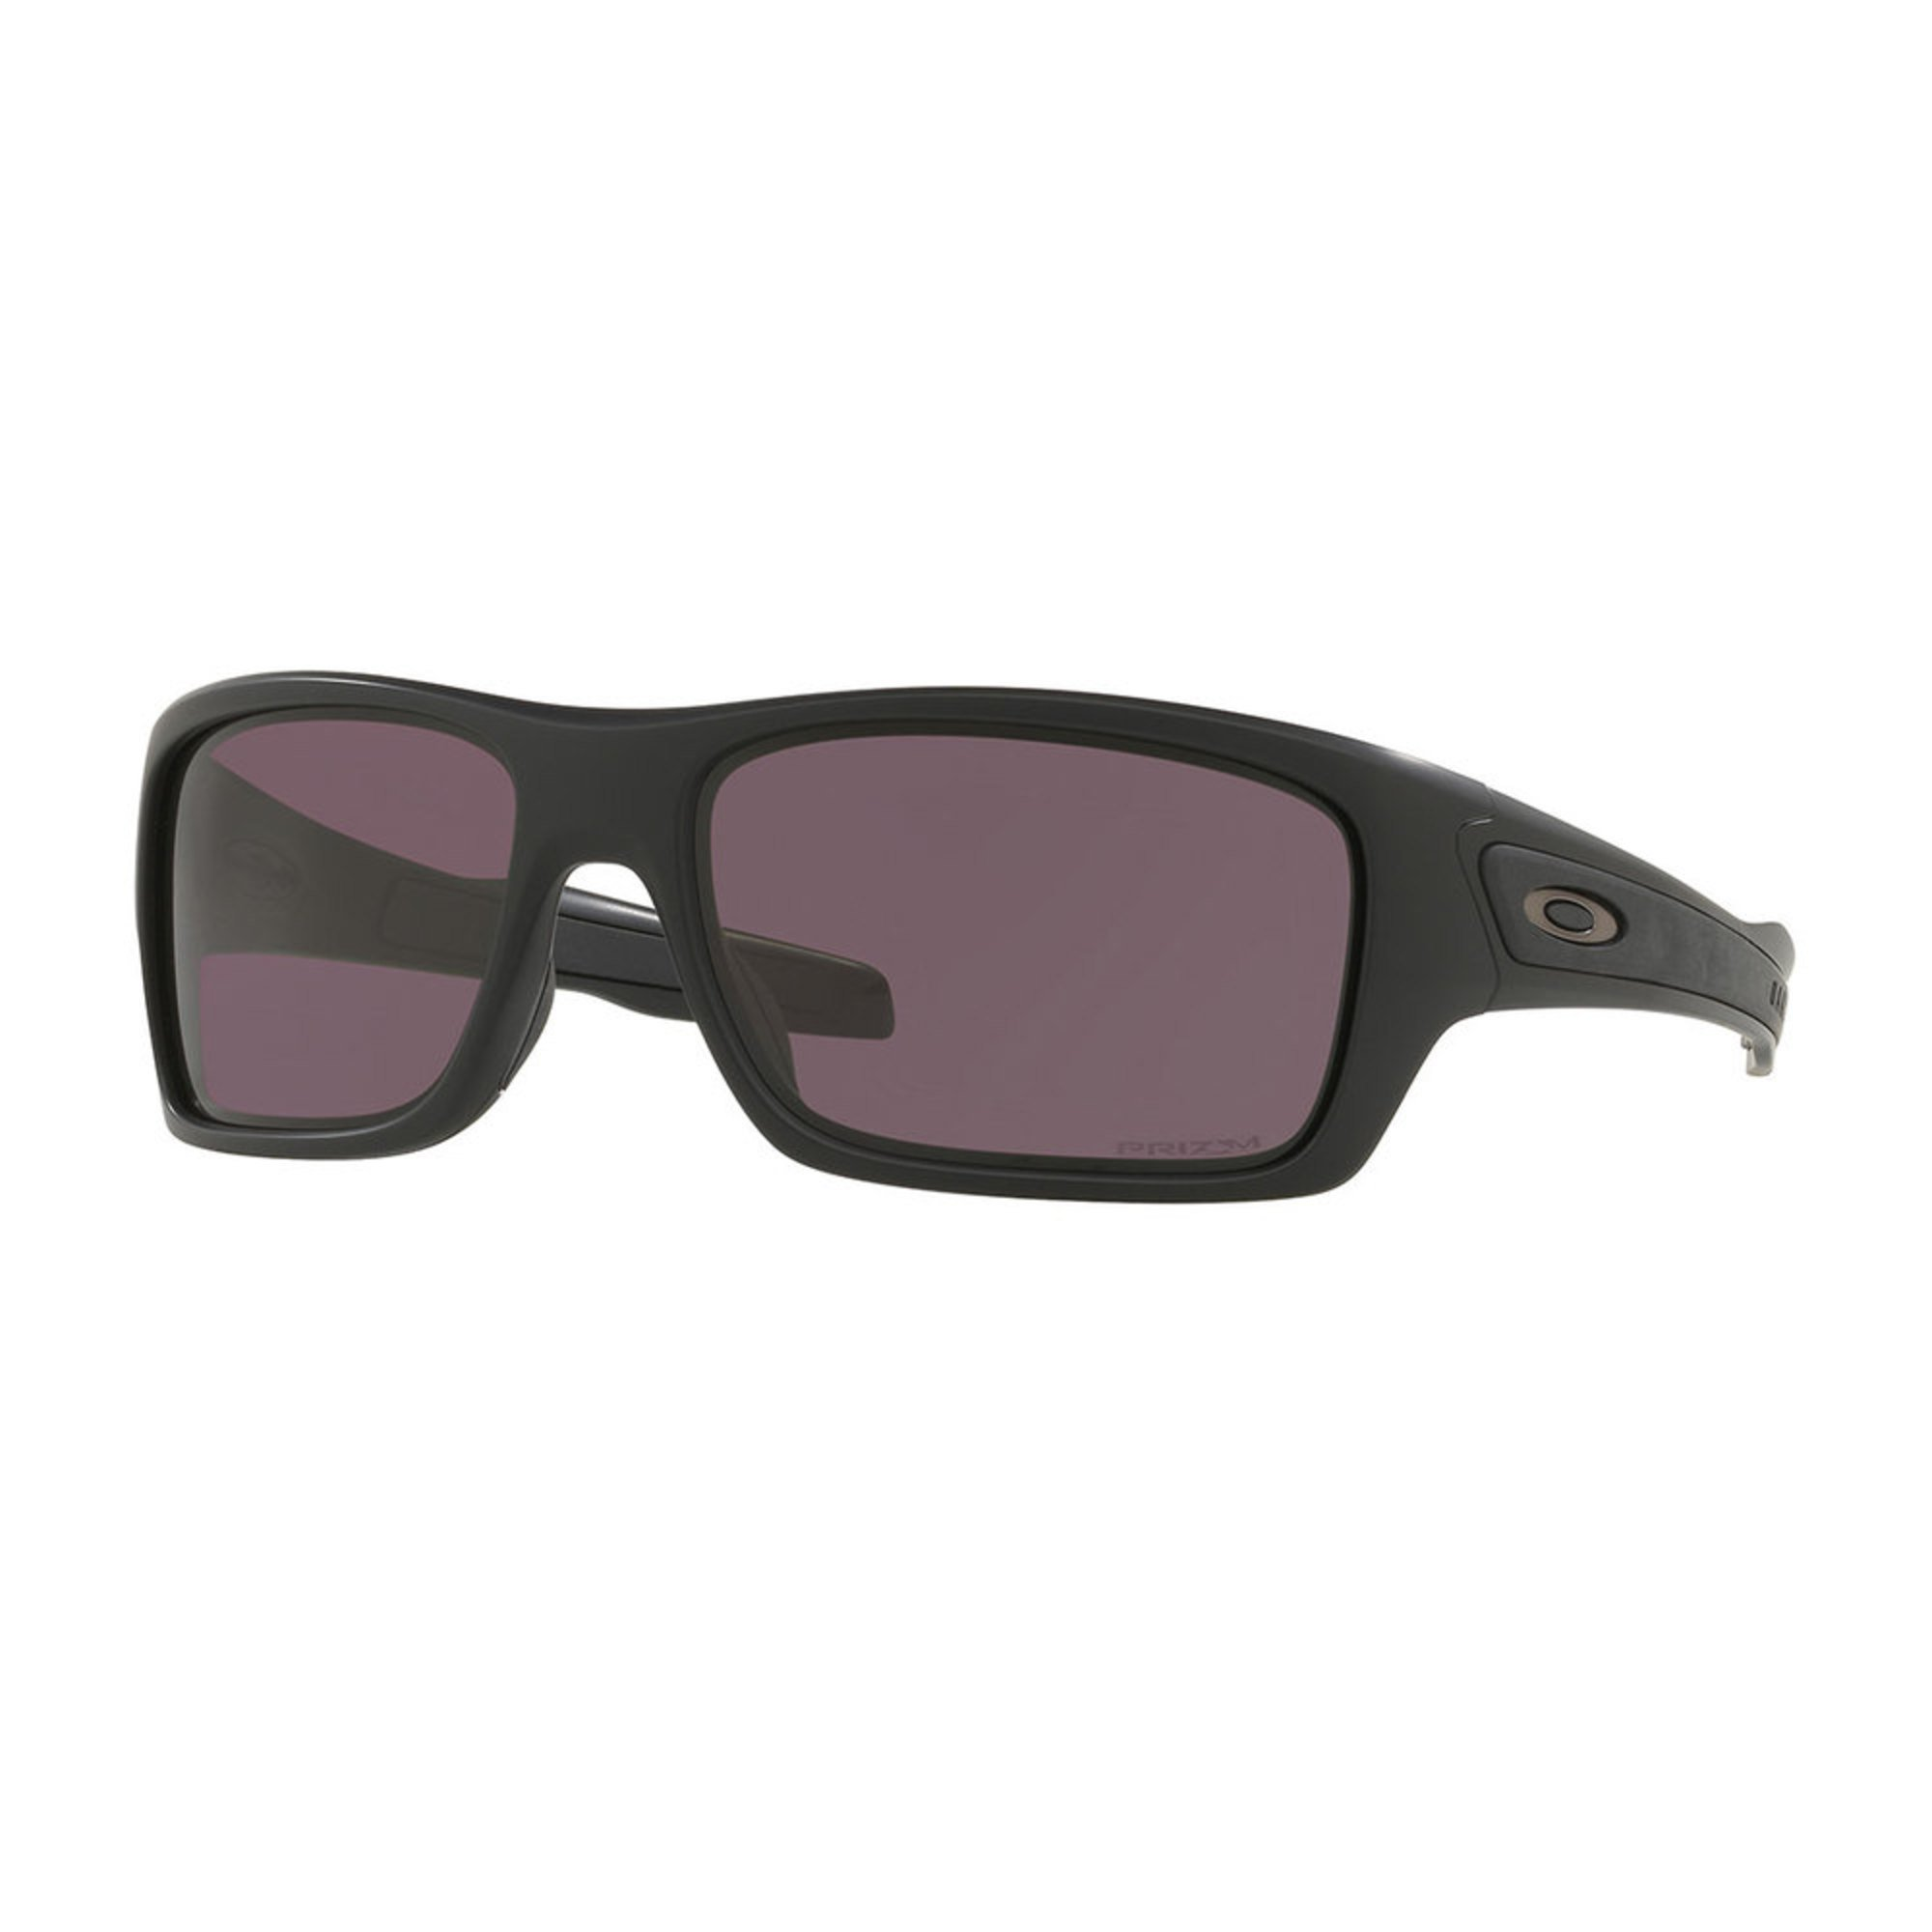 9c550afdc908 Oakley Men's Standard Issue Turbine Prizm Sunglasses | Men's ...